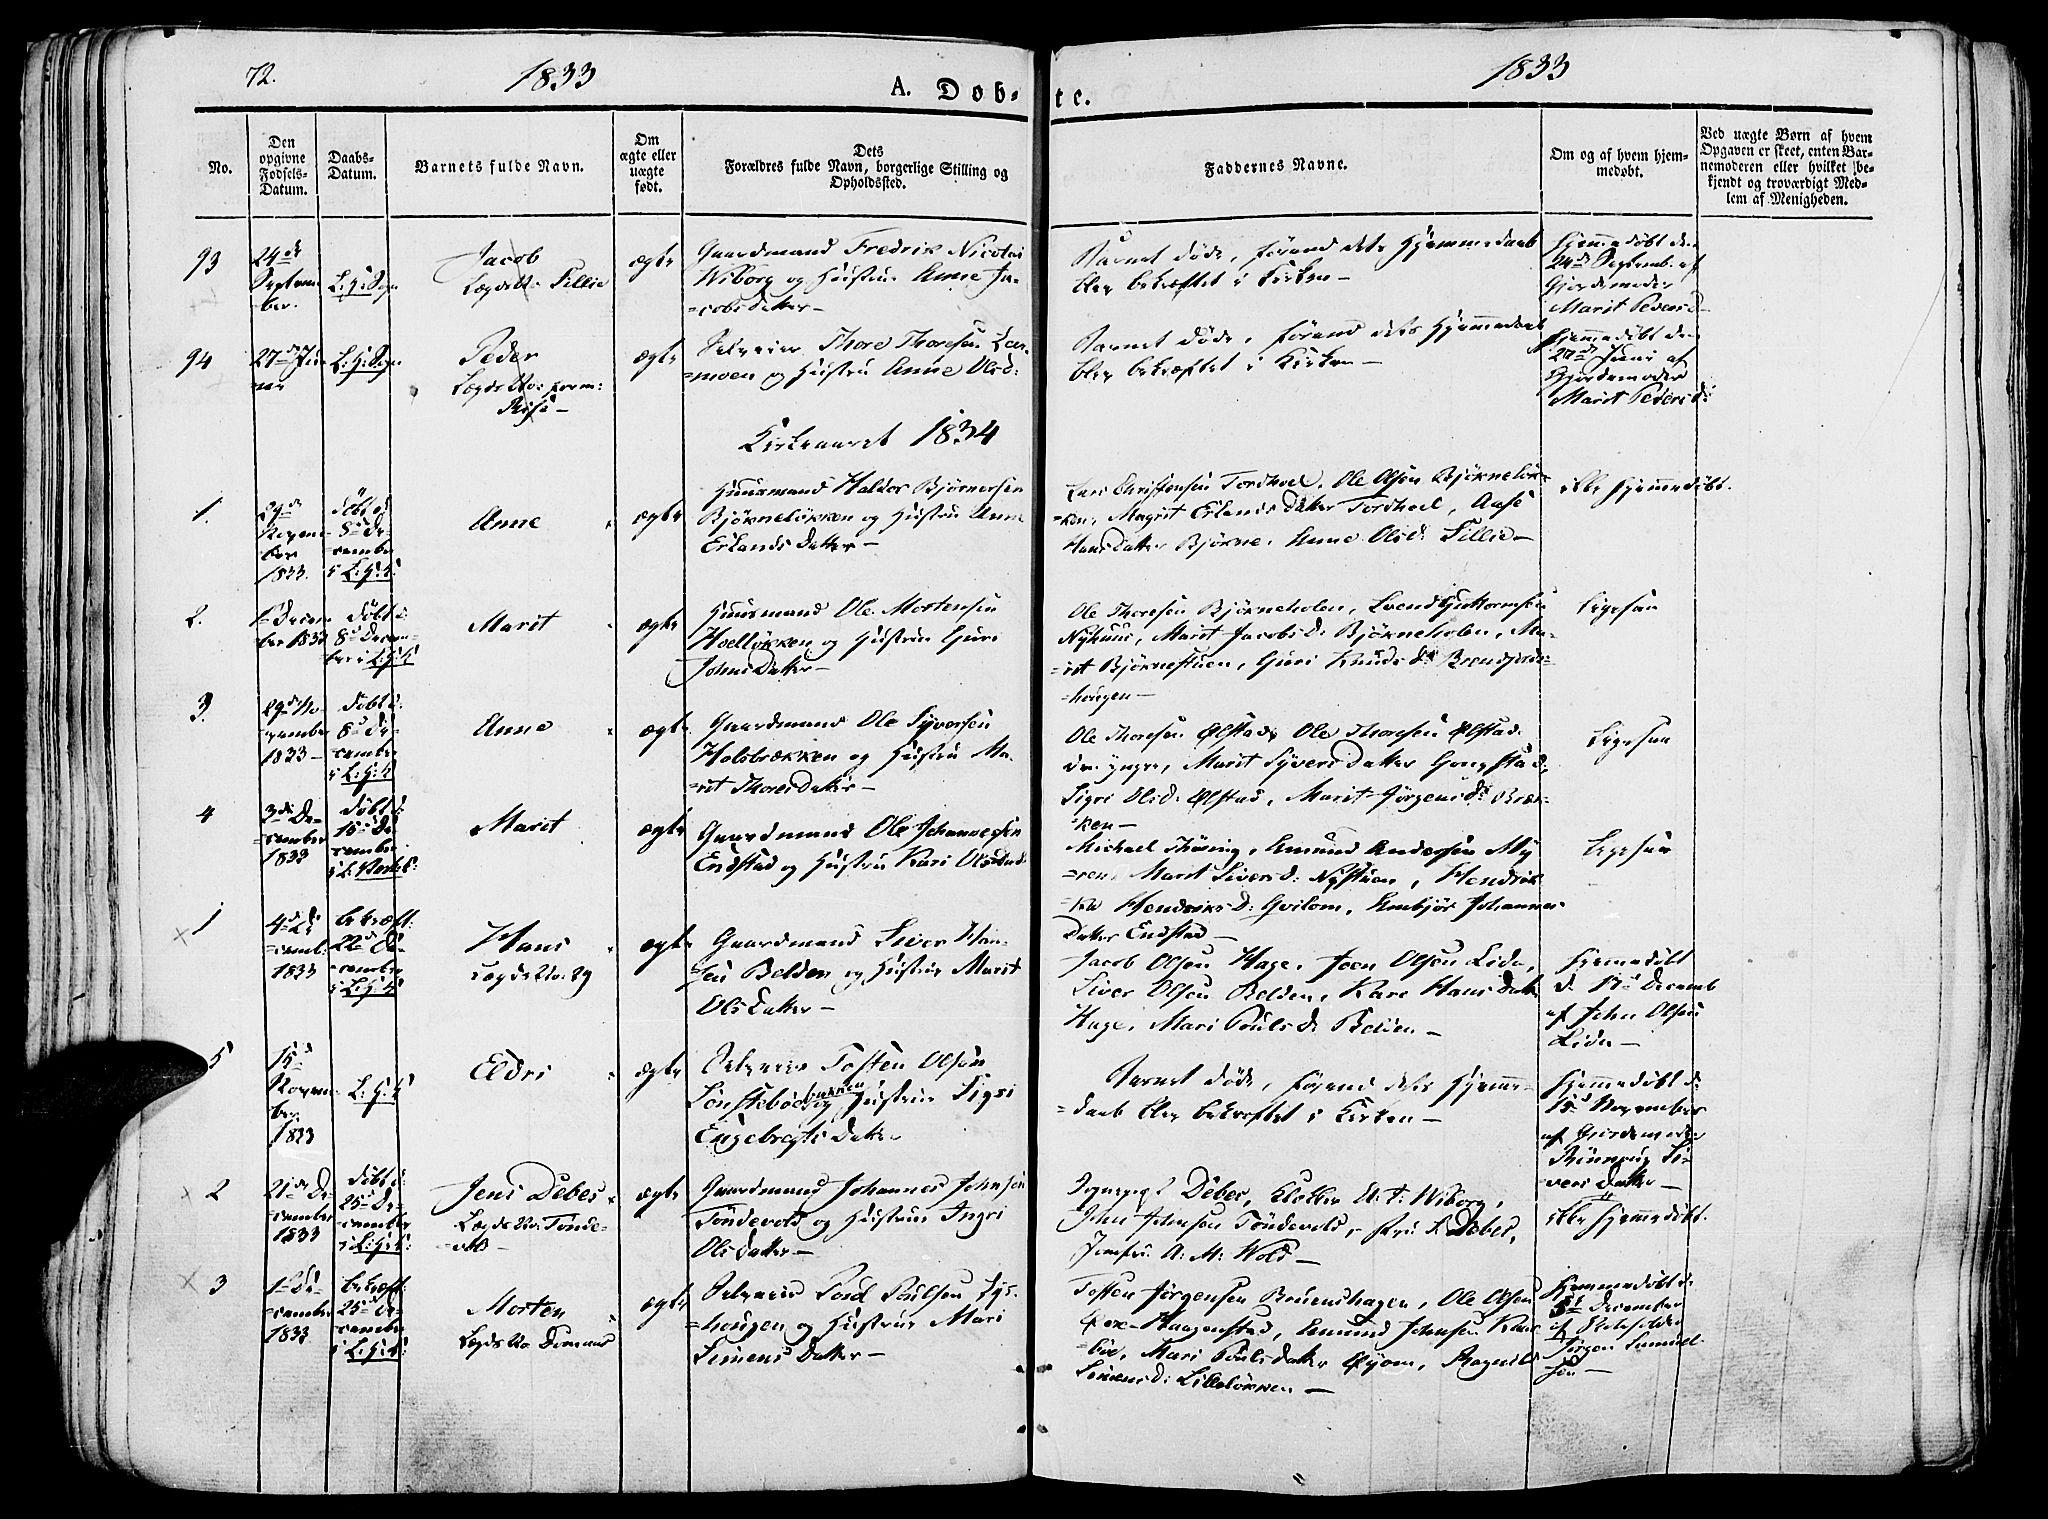 SAH, Lesja prestekontor, Ministerialbok nr. 5, 1830-1842, s. 72